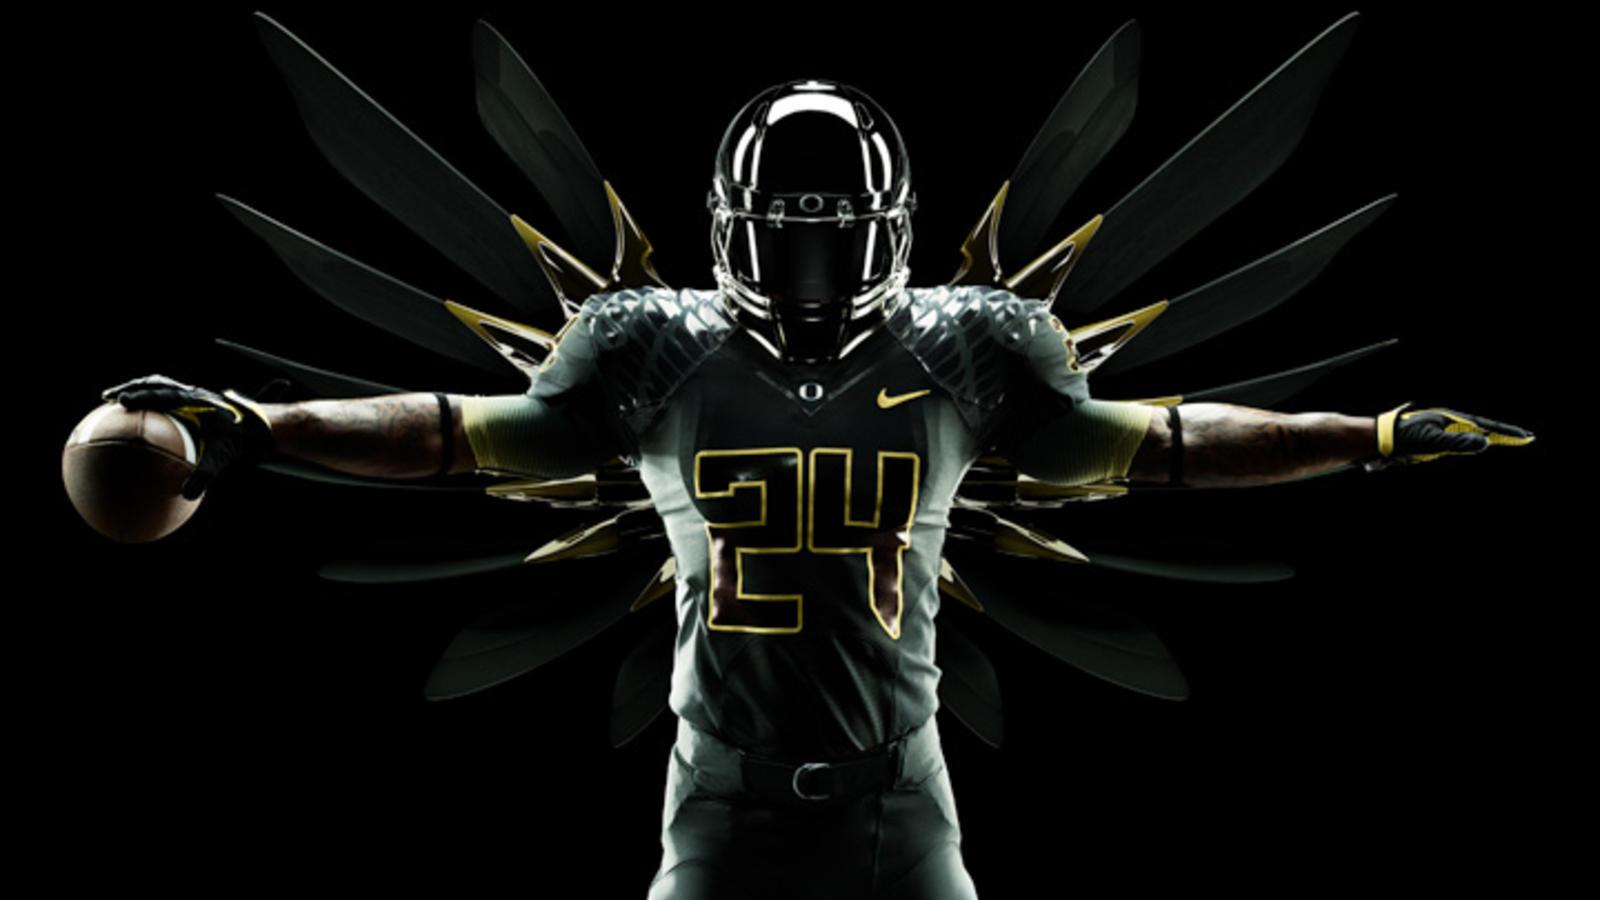 best service d011a 95efa Nike unveils new integrated uniform system for Oregon Ducks ...